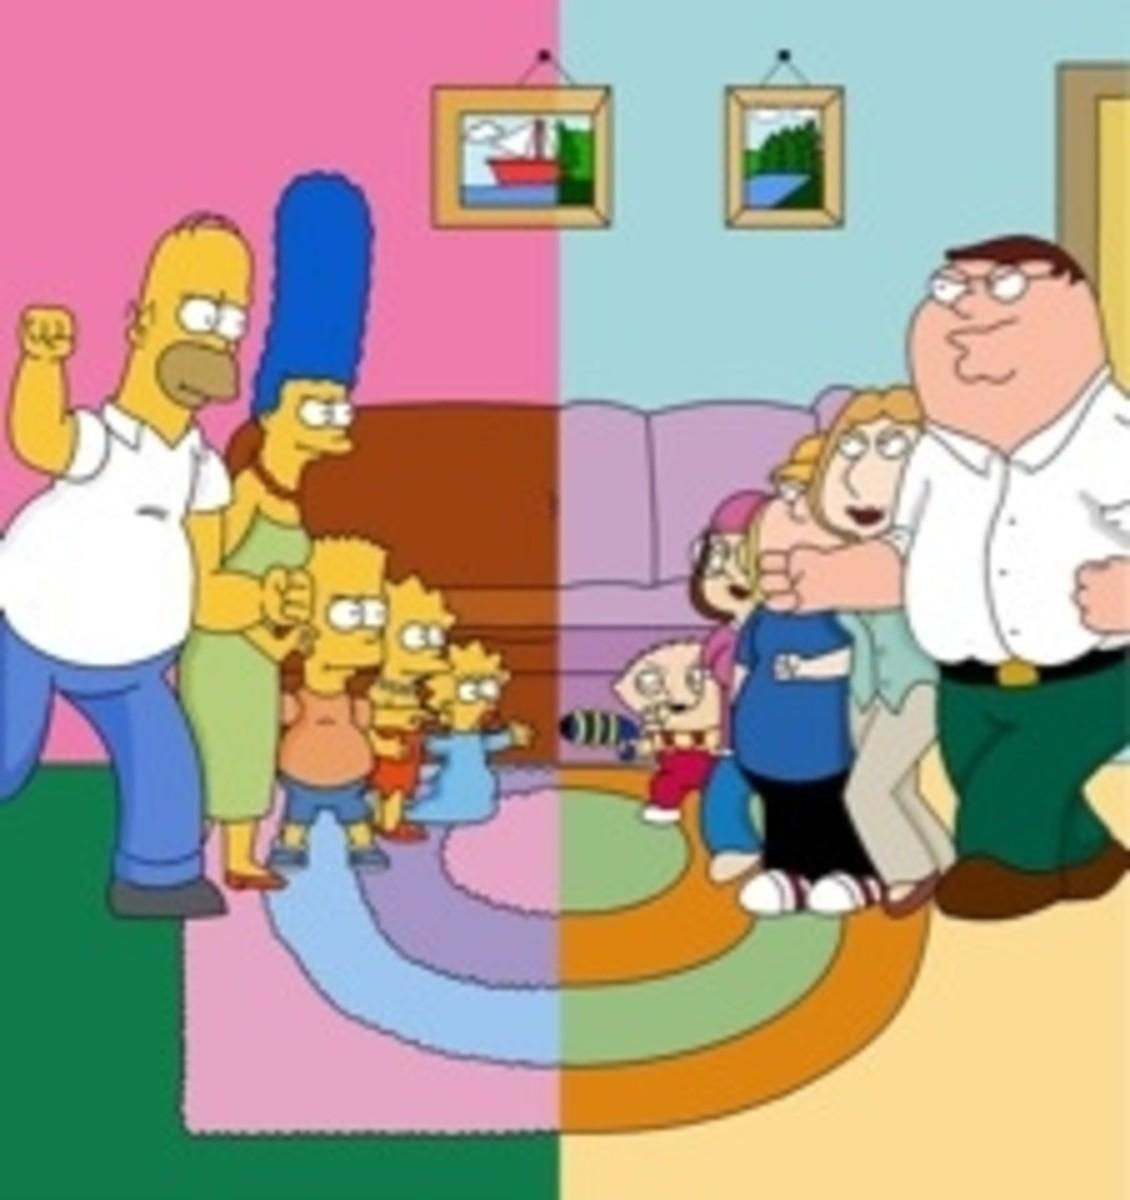 Family Guy vs The Simpsons